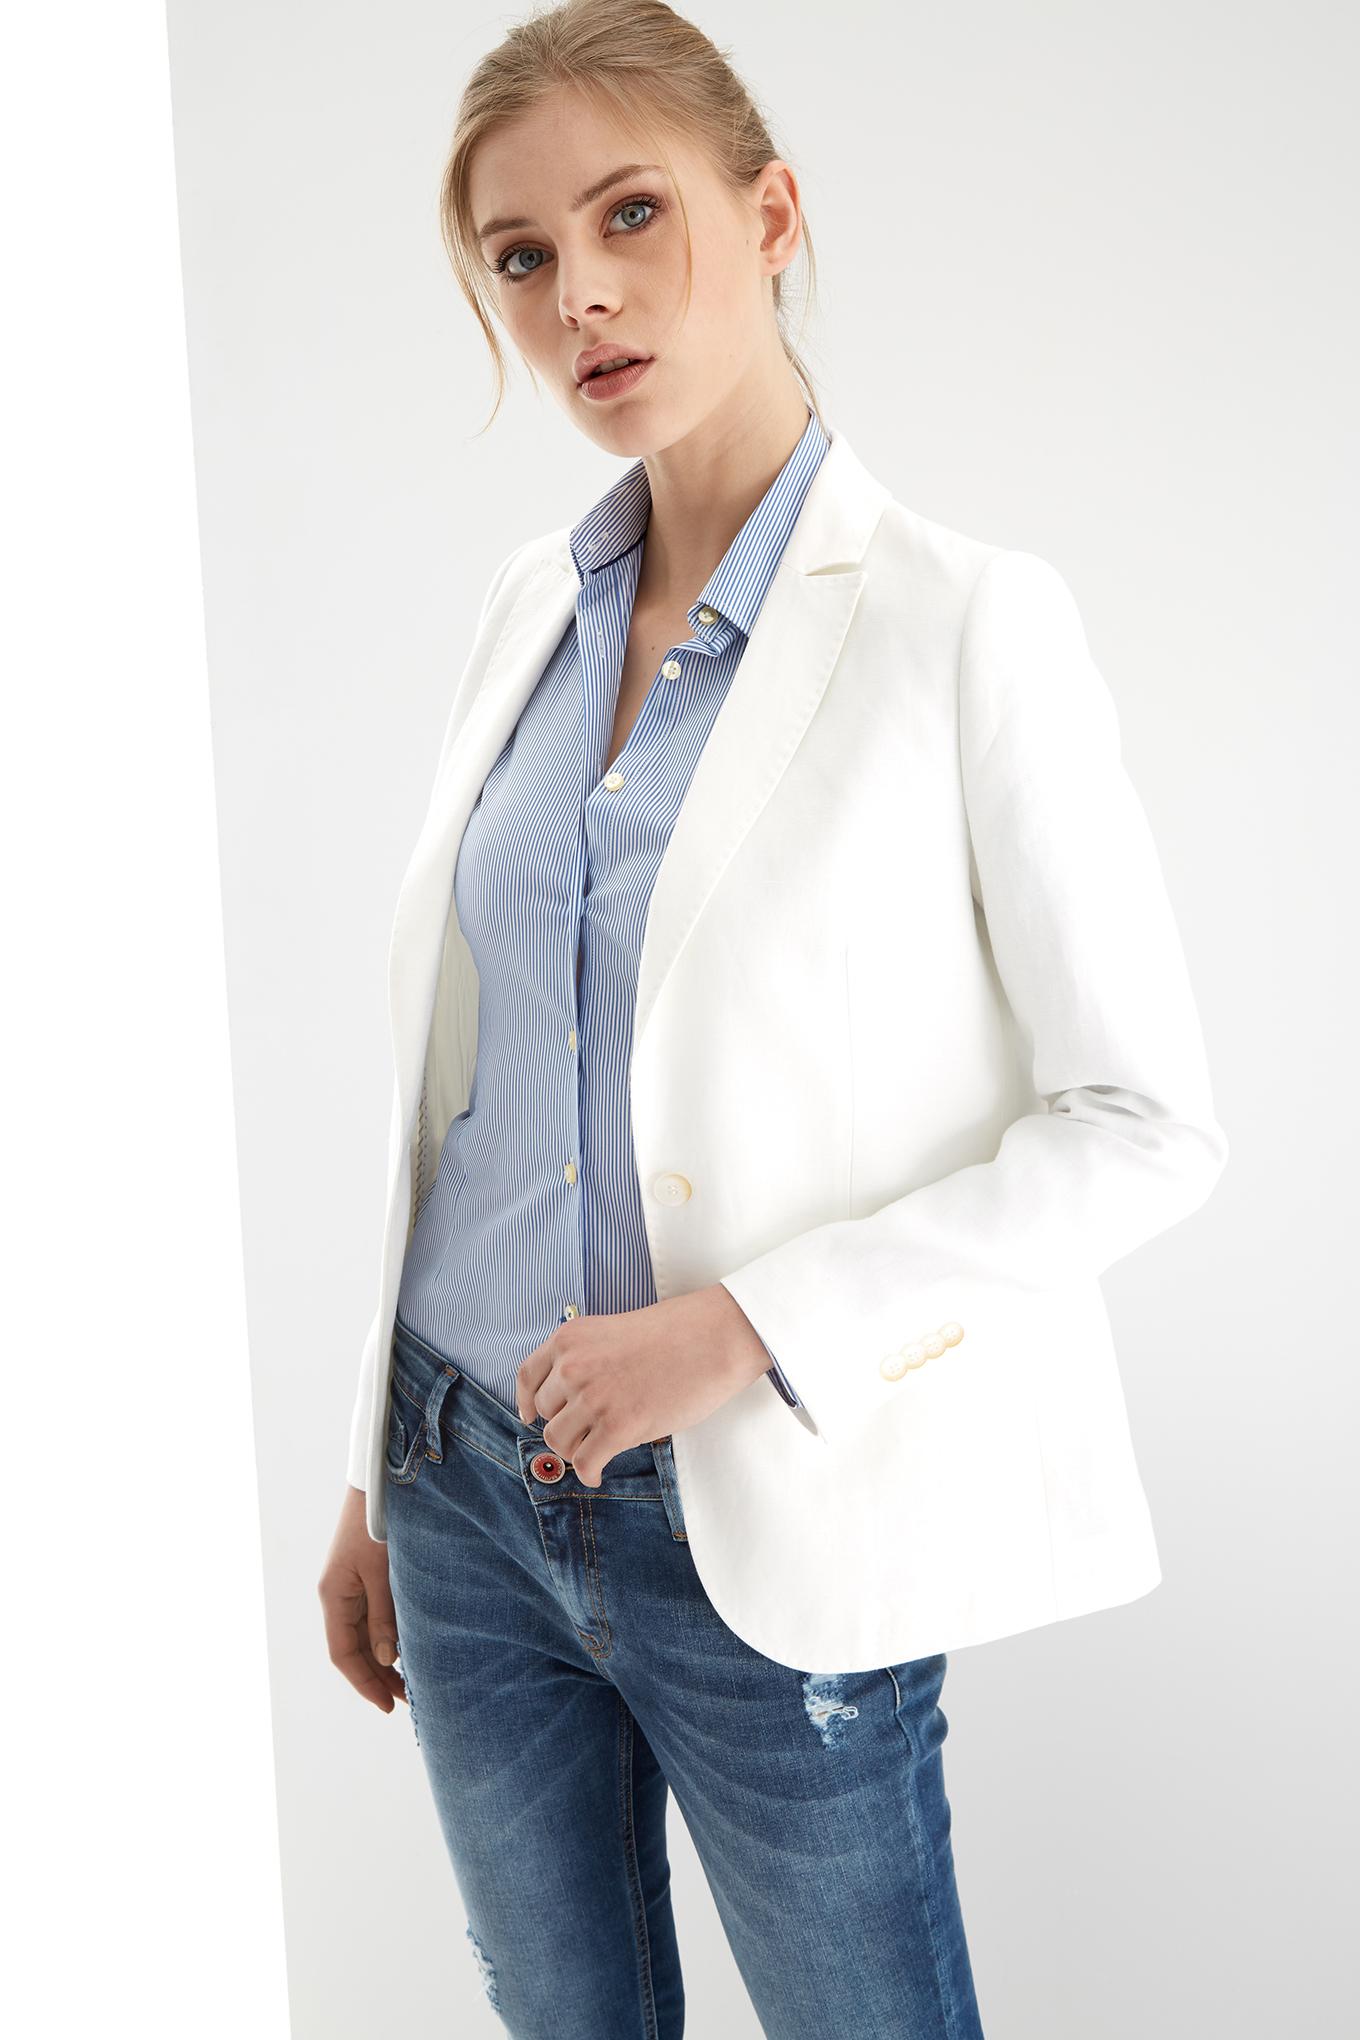 Blazer Branco Classic Mulher